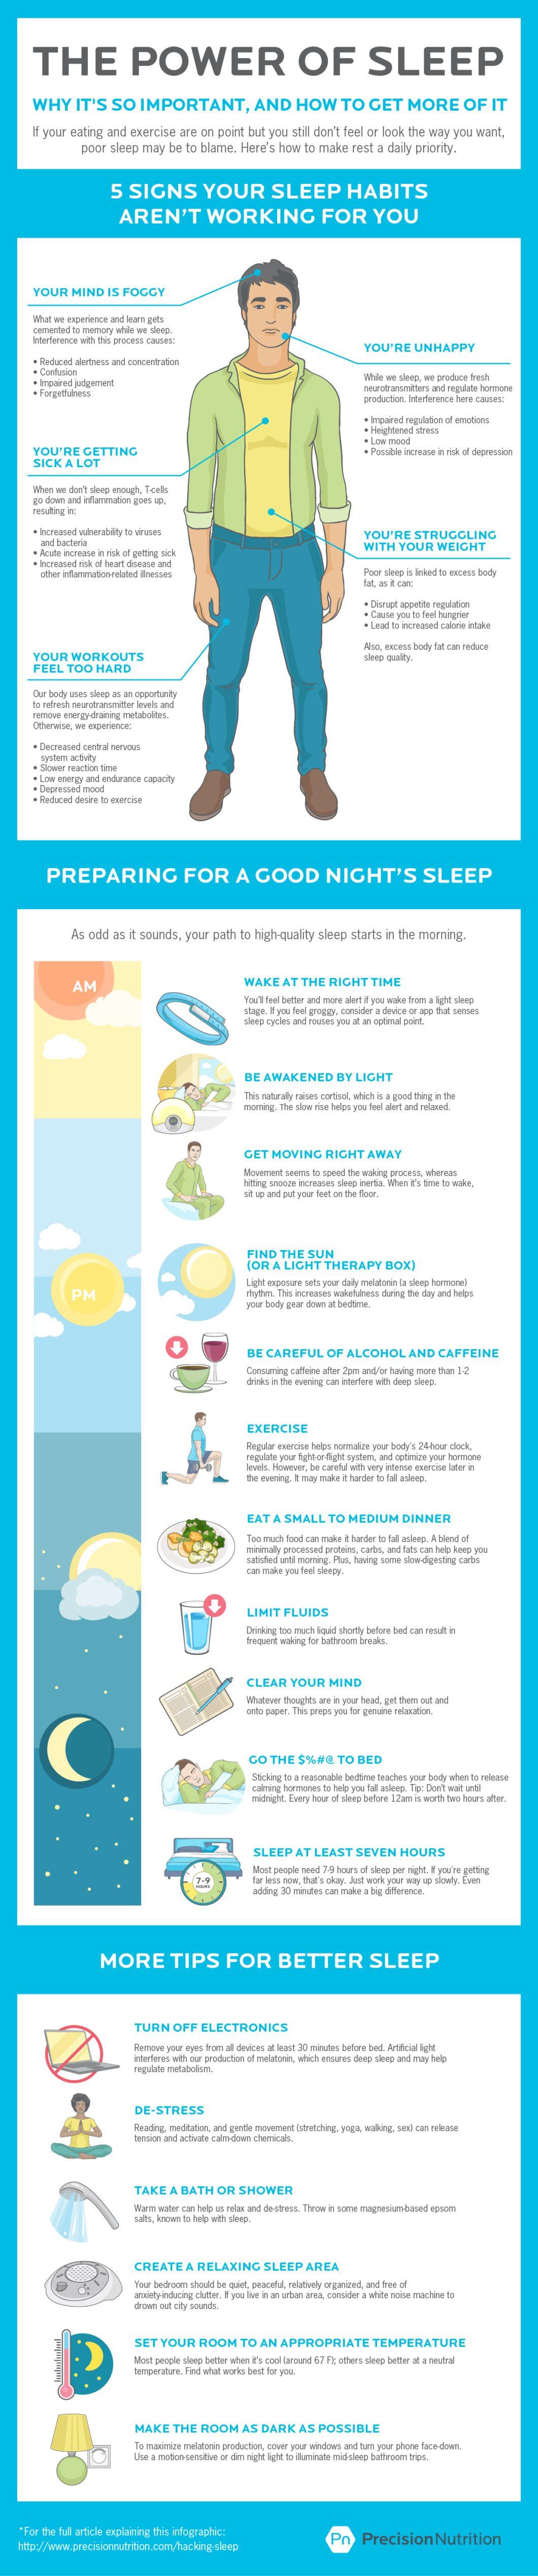 PN sleep infographic